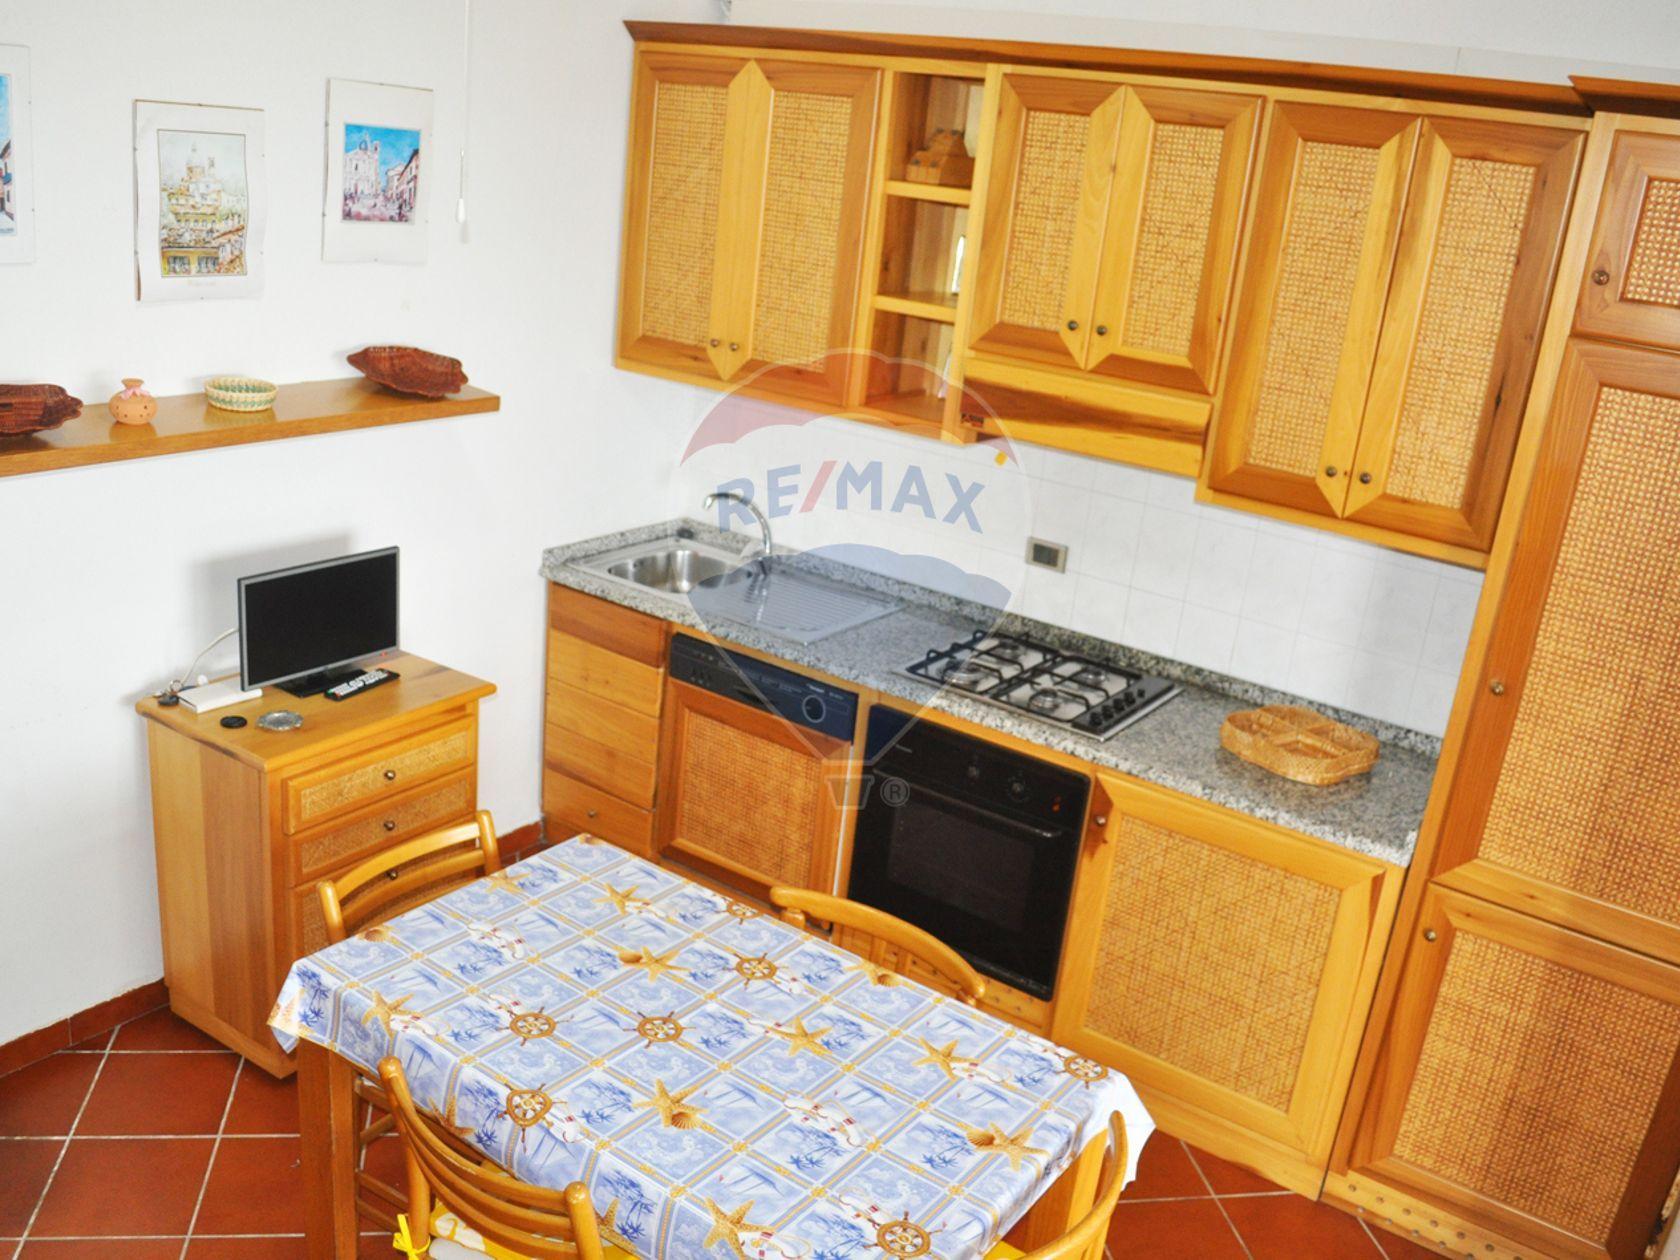 Appartamento Portu Maga, Arbus, VS Vendita - Foto 8